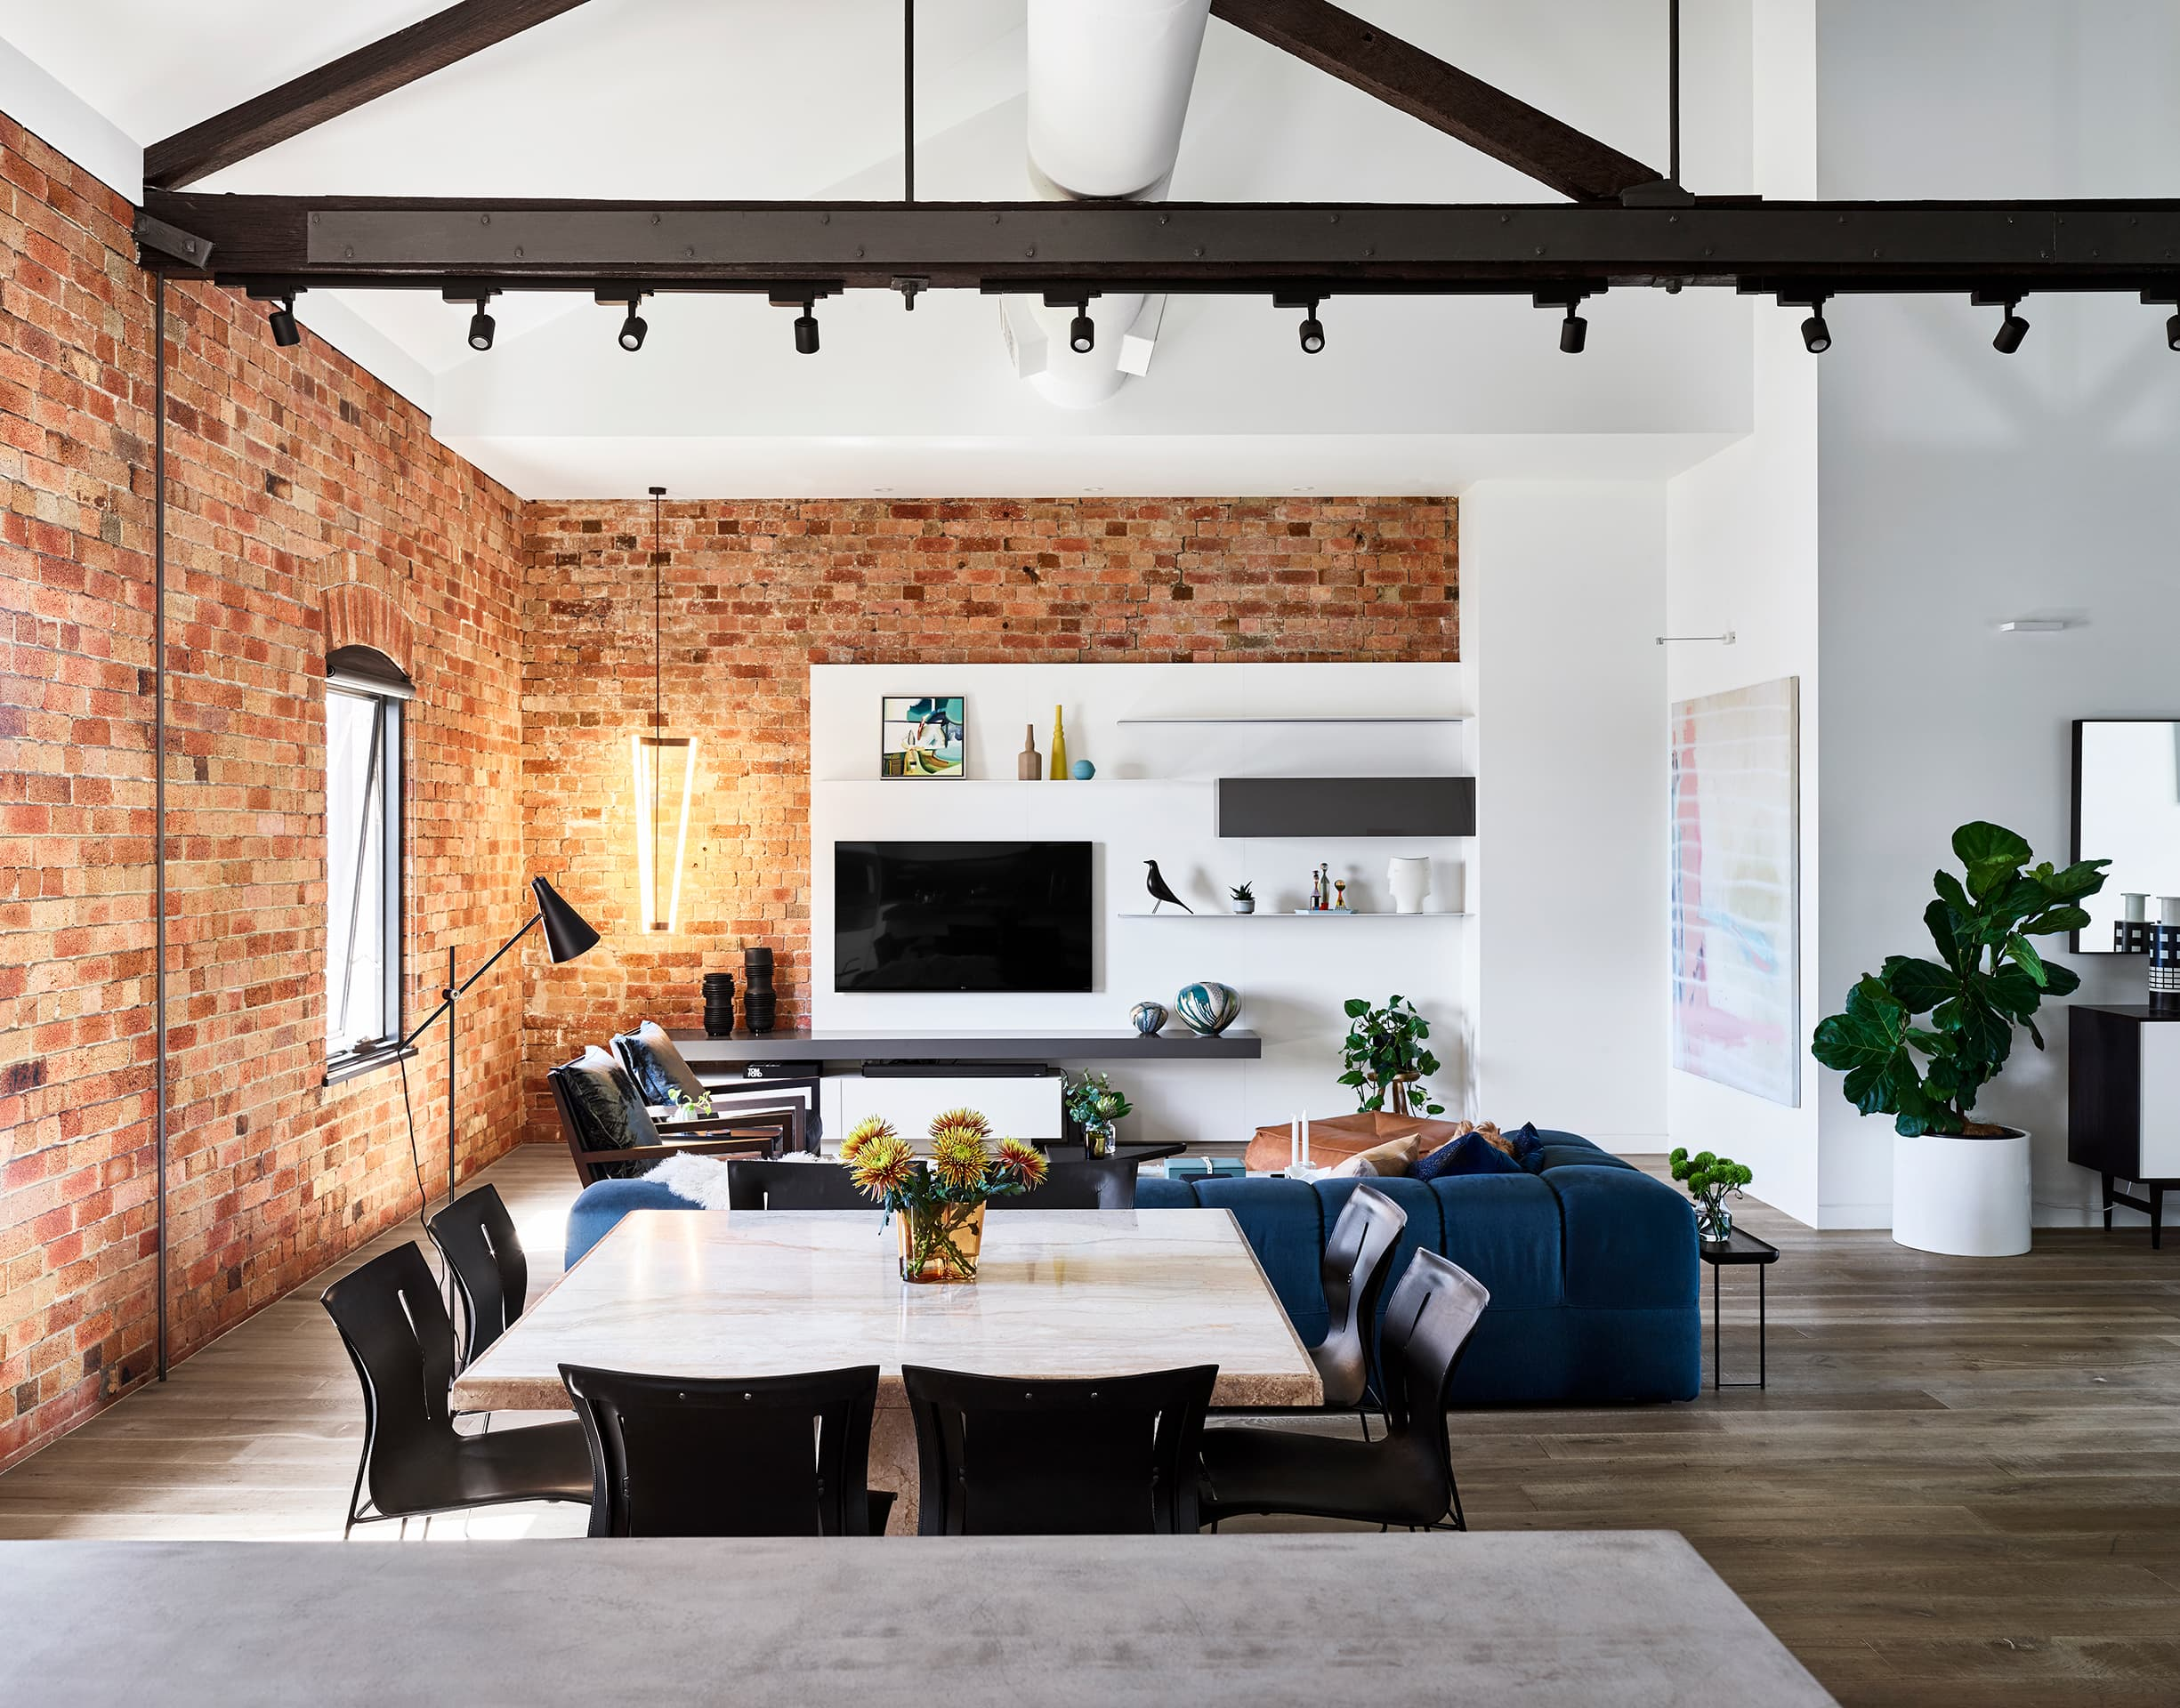 Interior Design Brisbane - The Refinery Penthouse